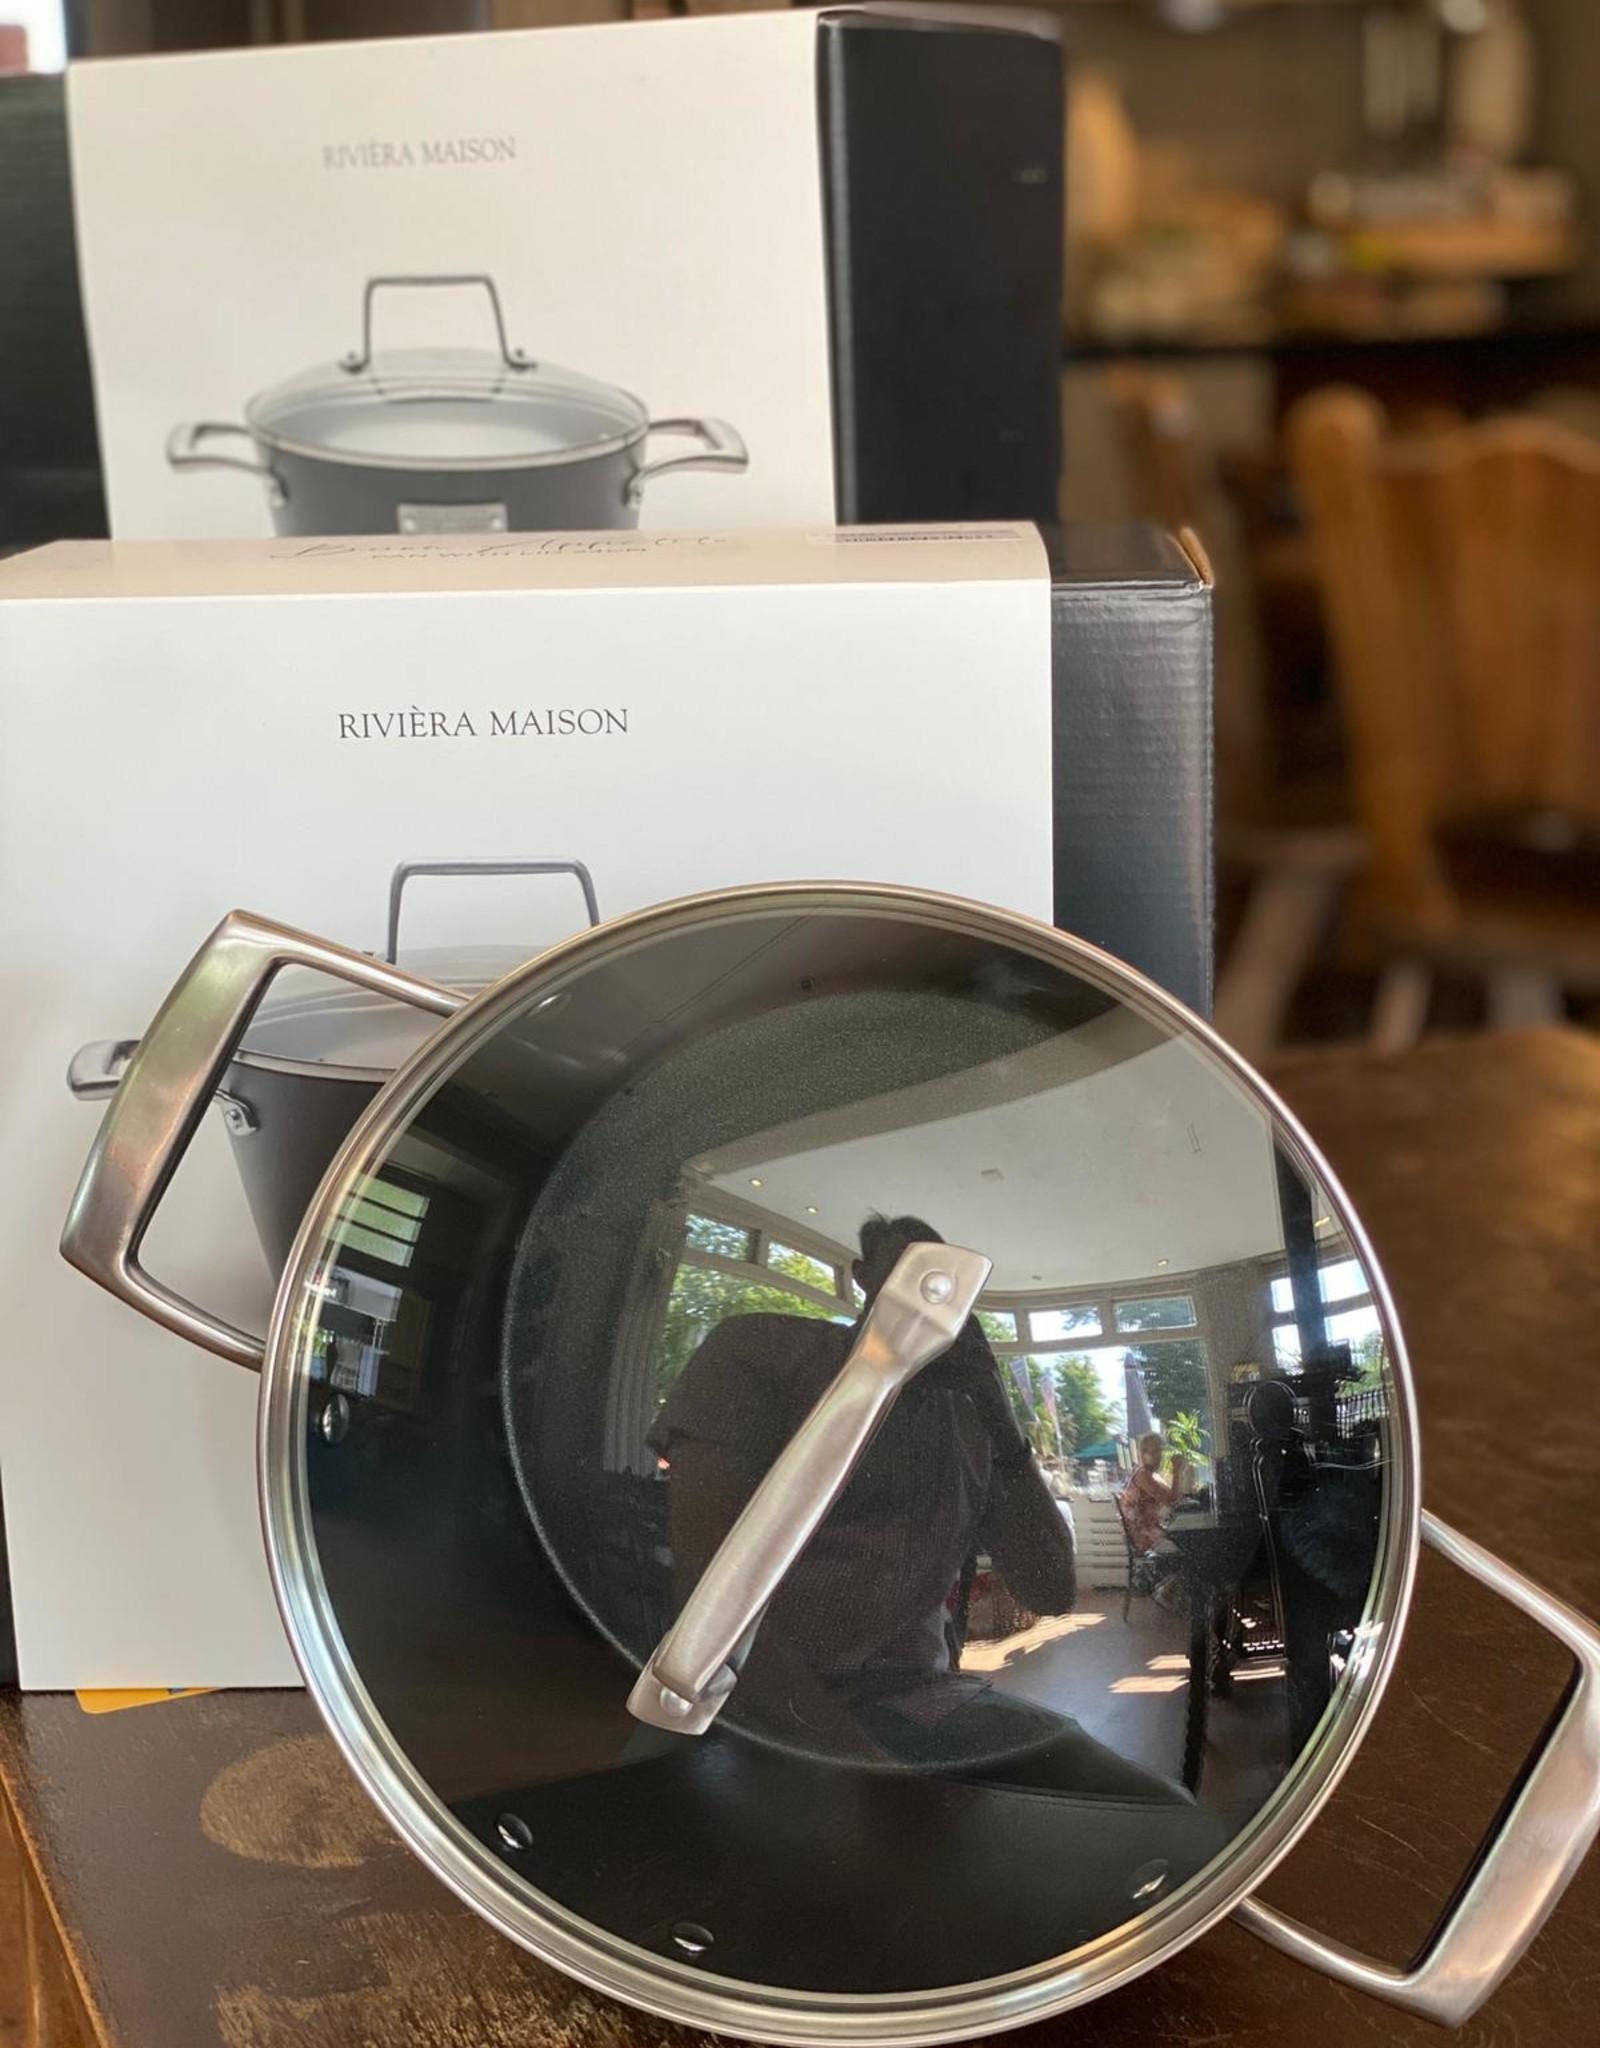 Riviera Maison Buon Appetito Casserole Pan With Lid